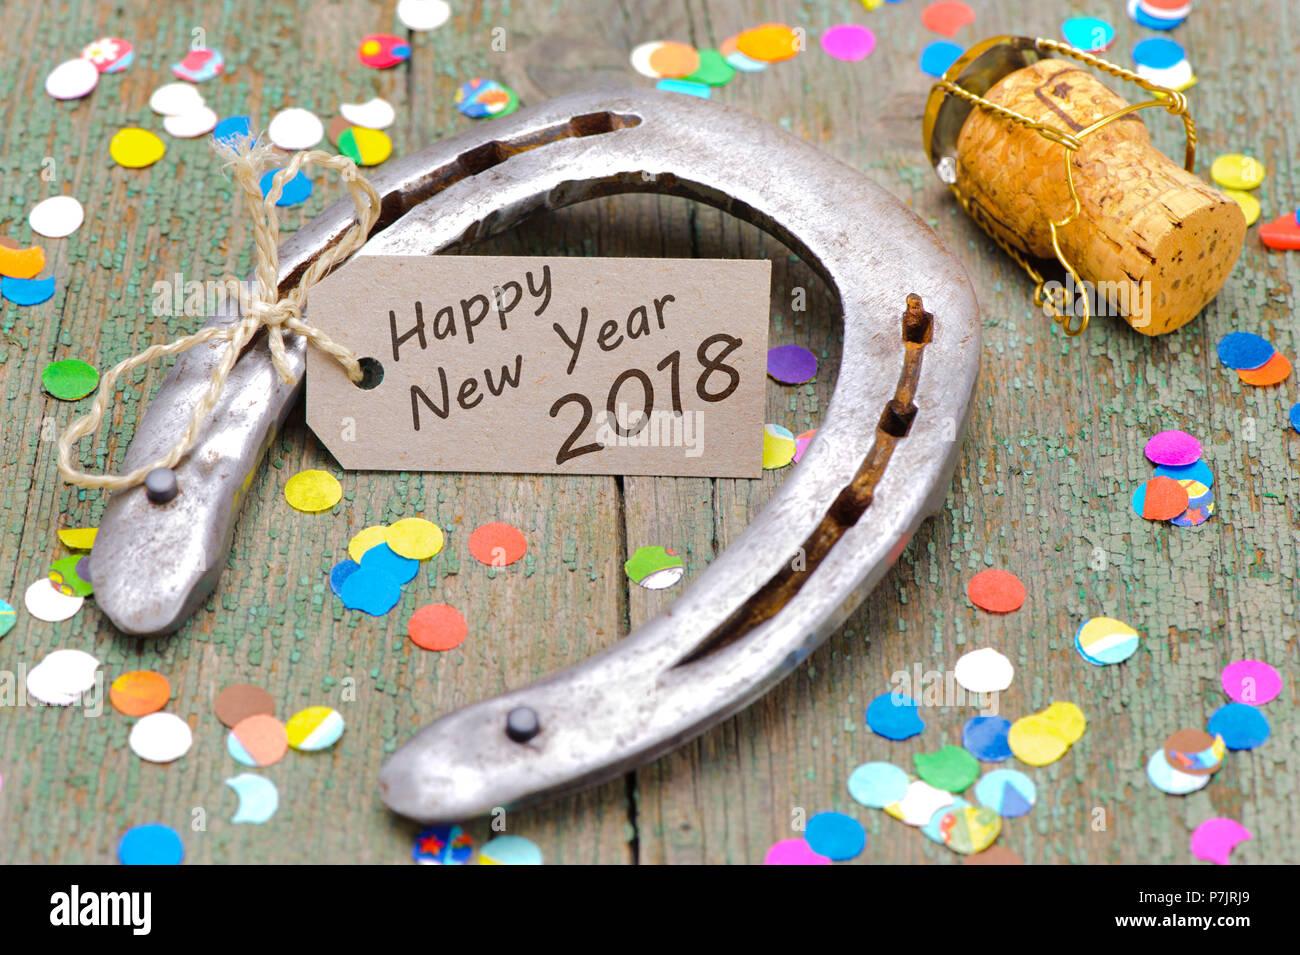 horseshoe with happy new year wishes 2018